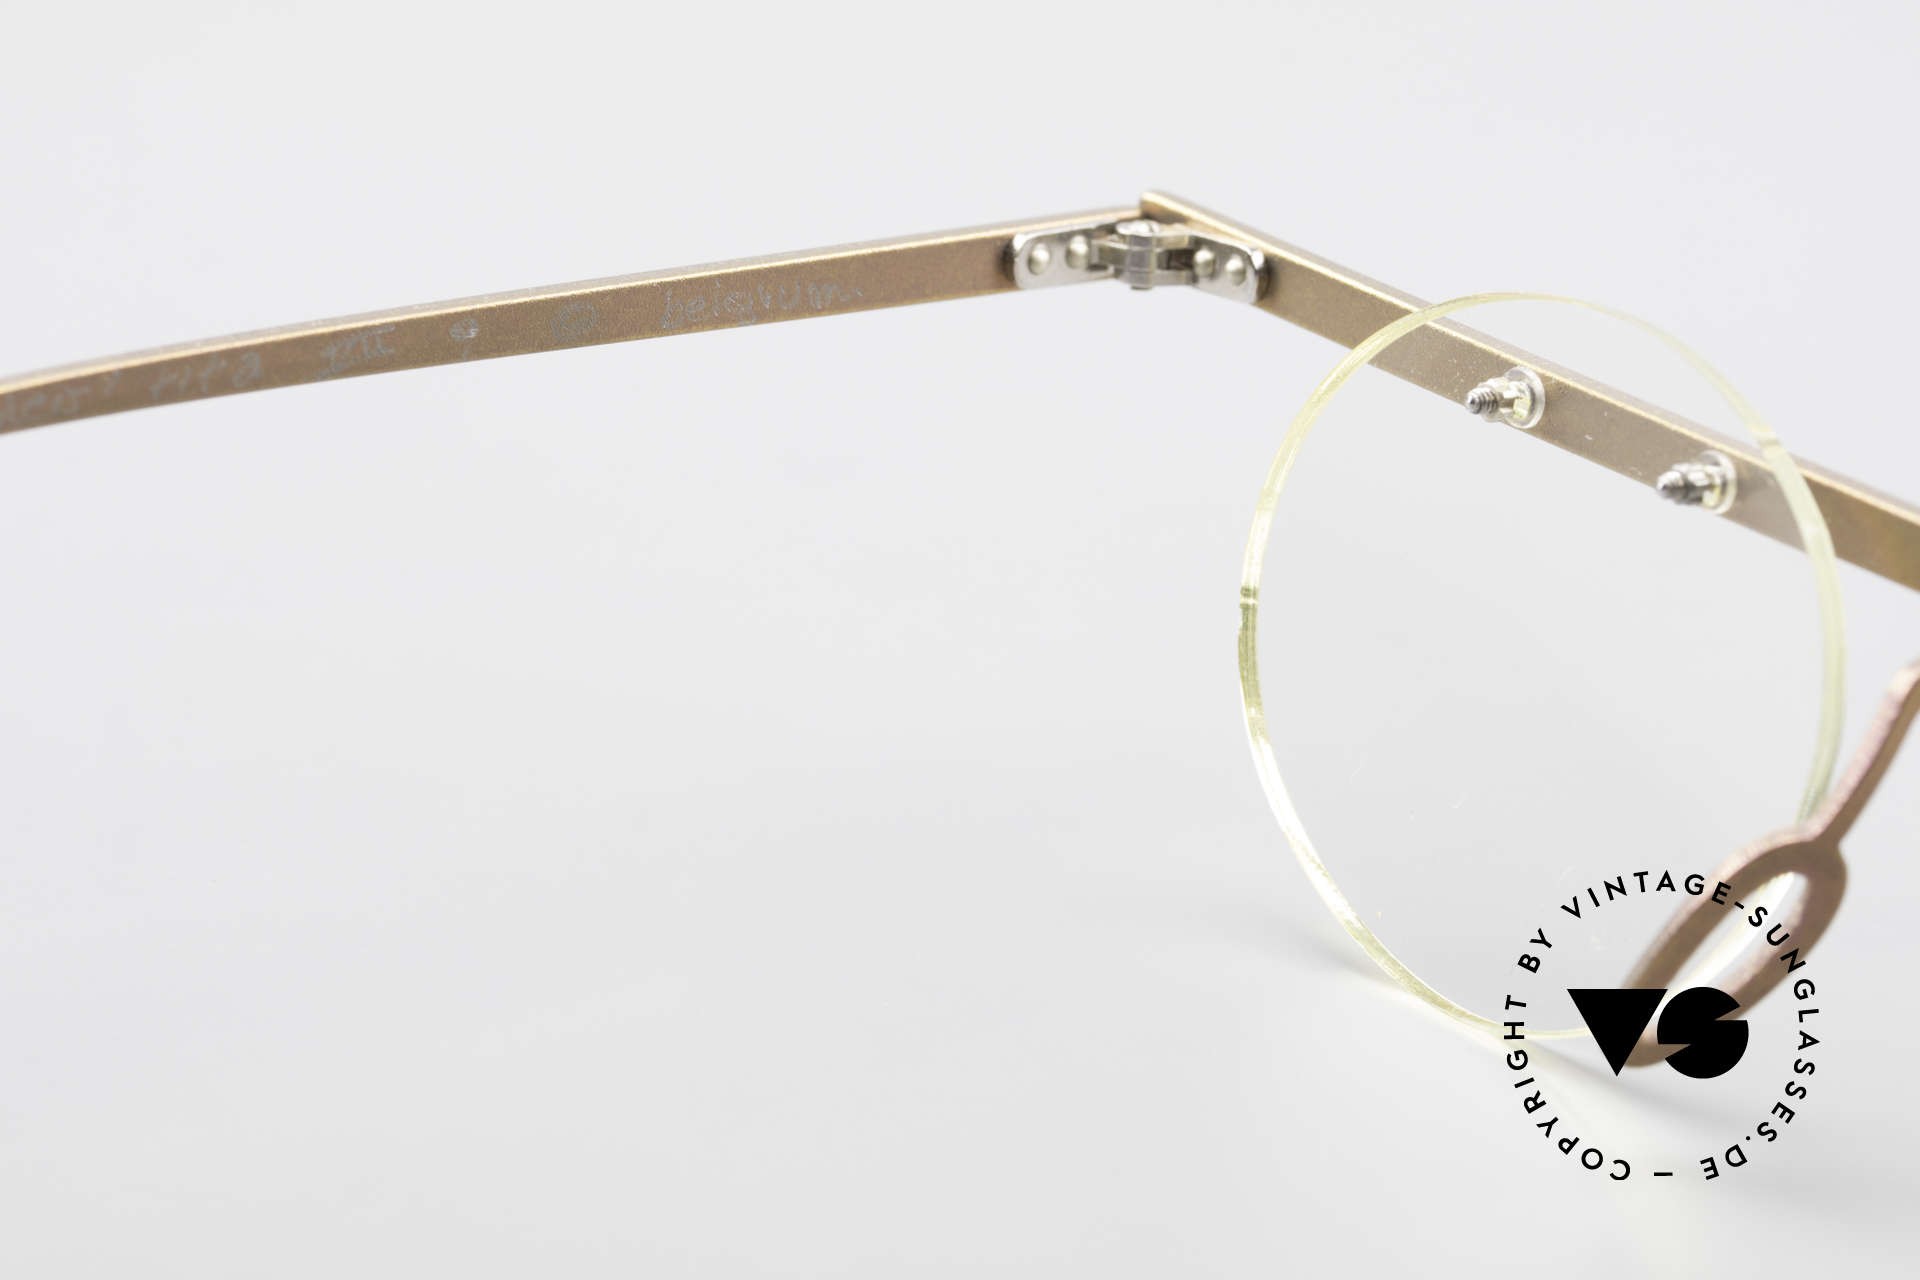 Theo Belgium Tita VII 9 Vintage Titanium Eyeglasses, an old, unworn THEO original and NO RETRO EYEWEAR, Made for Men and Women